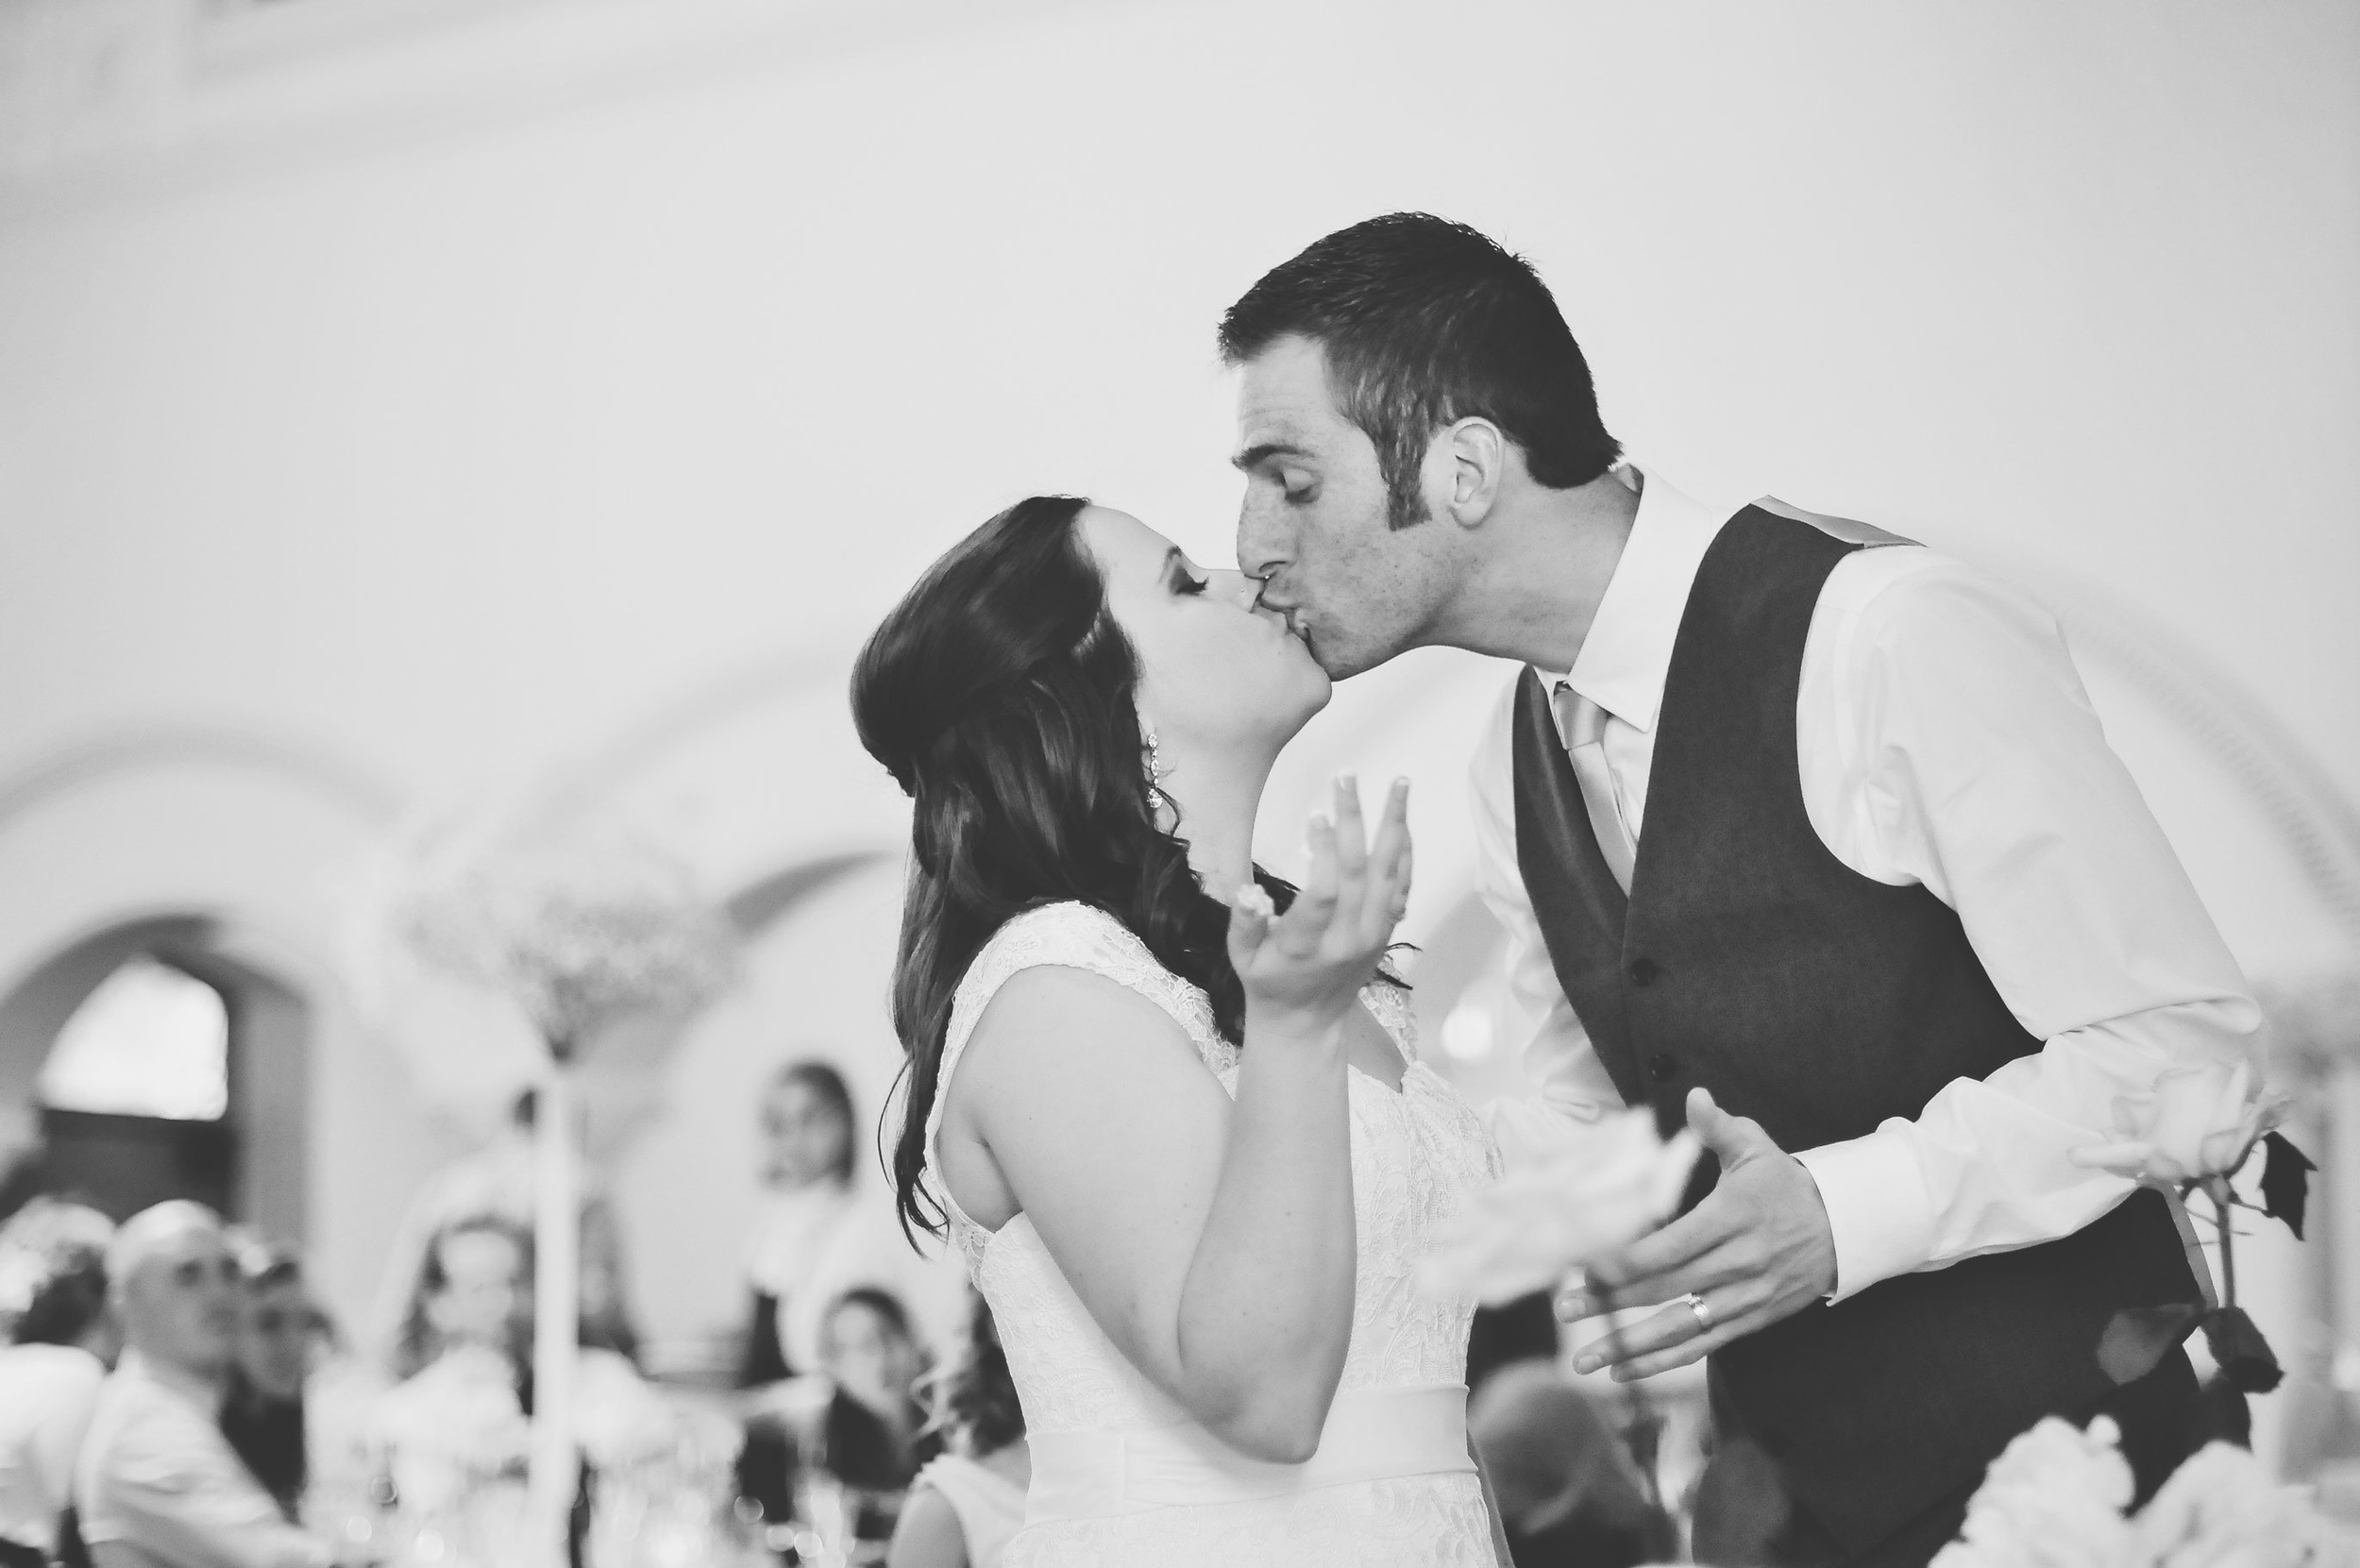 cornerstone-buidling-peoria-wedding-photographer-42.jpg